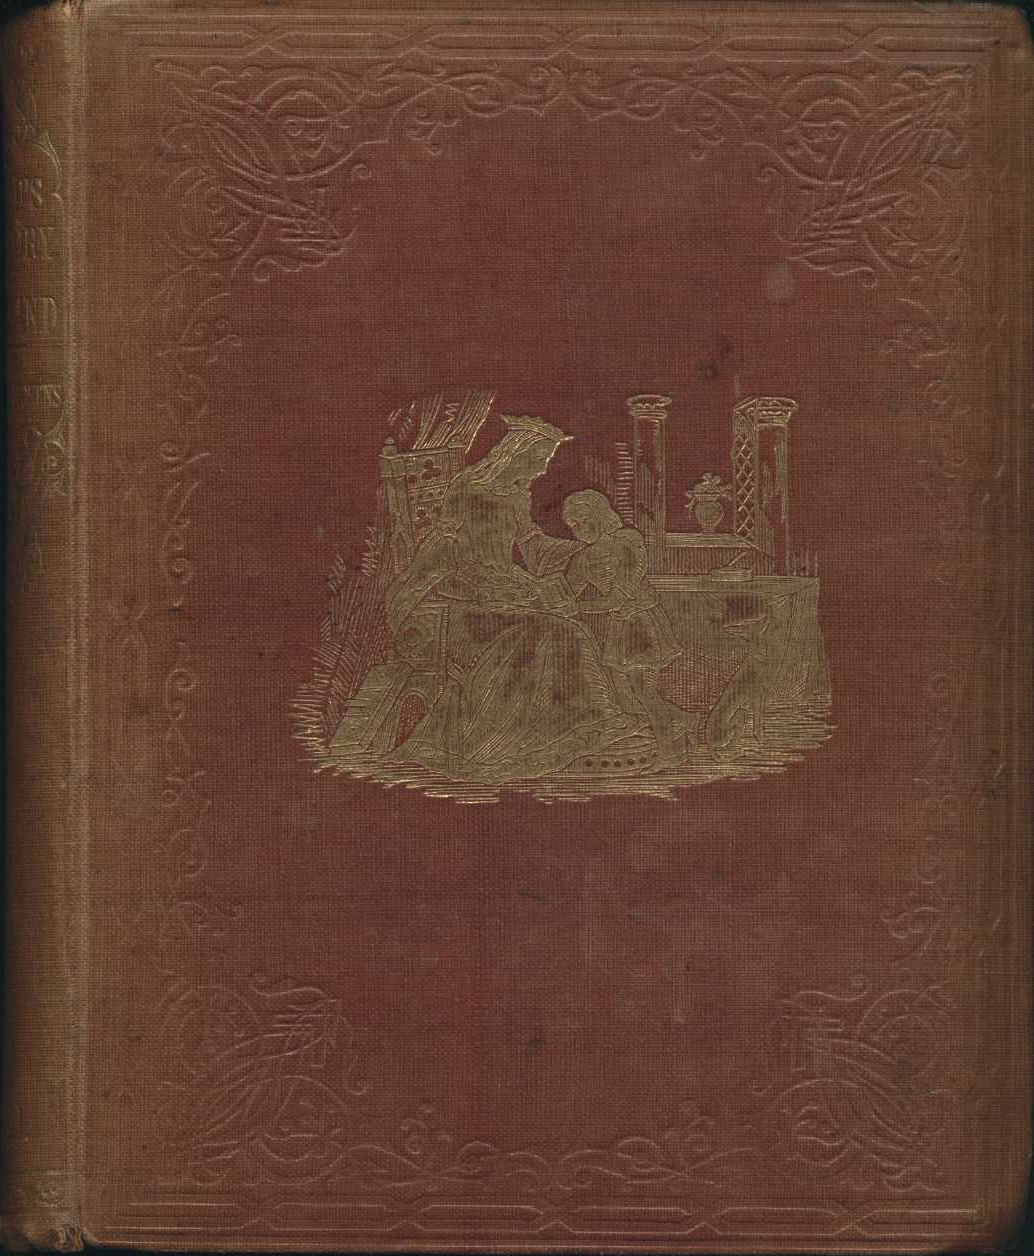 Charles Dickens. A child's history of England. London: Bradbury & Evans, 1852. Three volumes, Vol. 1 displayed.